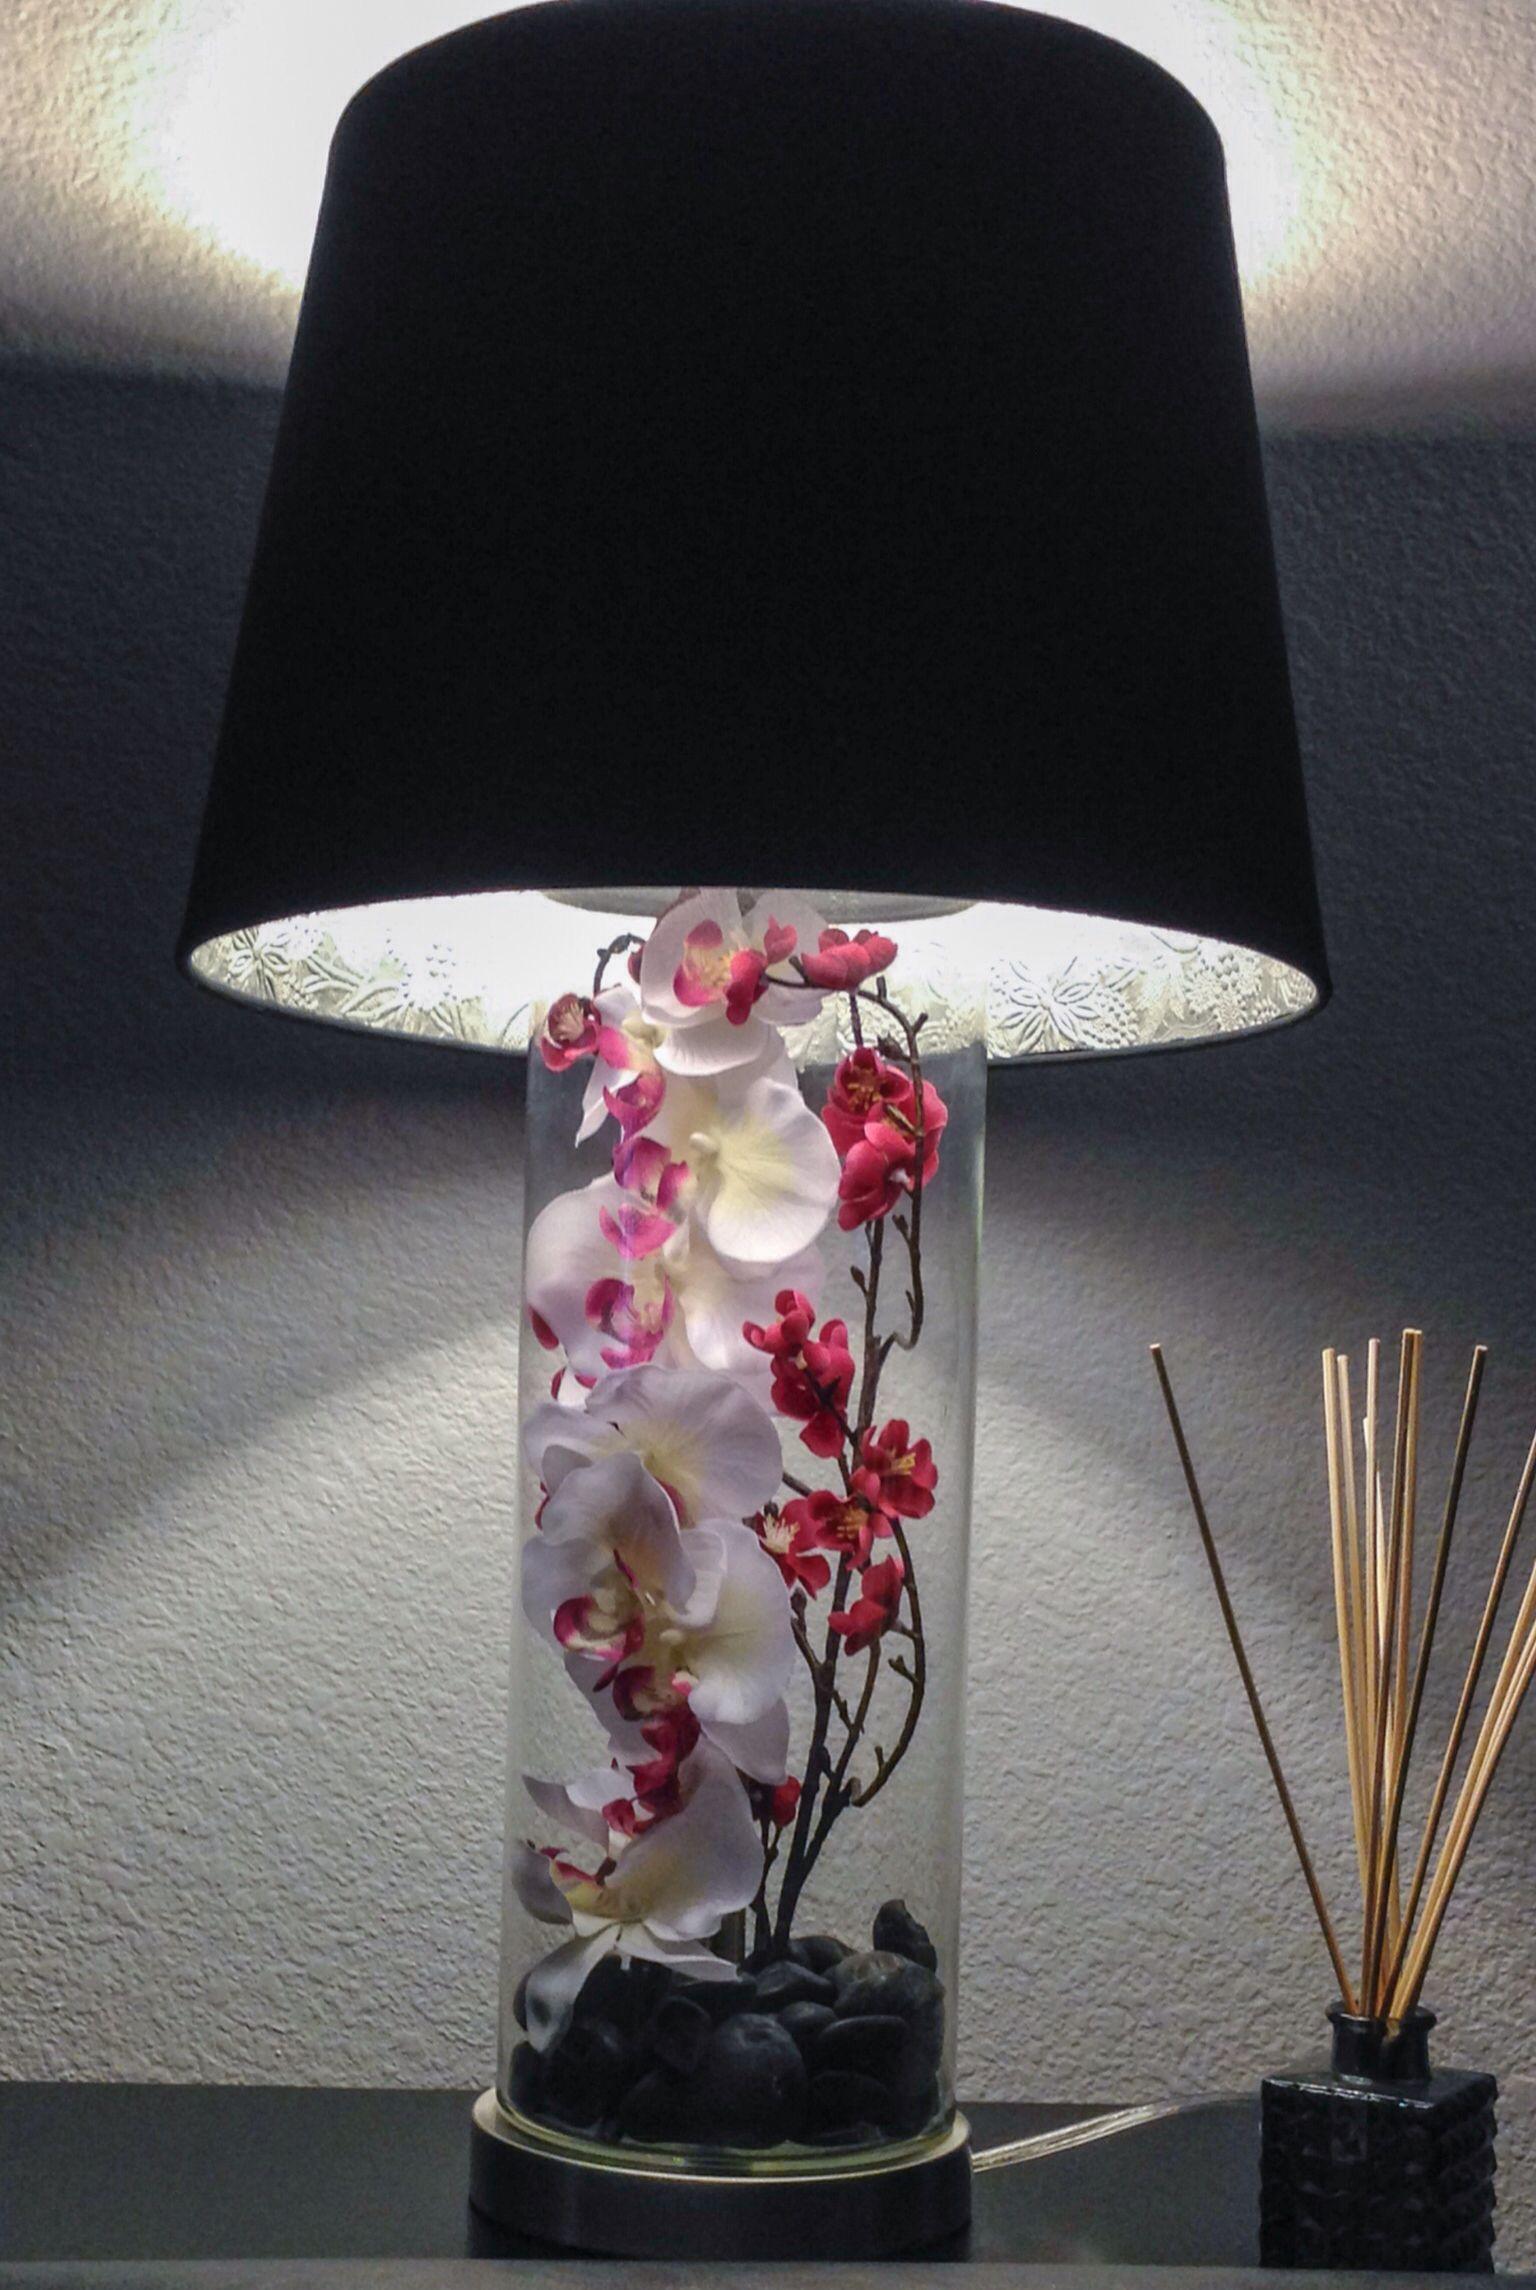 fillable lamp with orchids d i y crafts organization. Black Bedroom Furniture Sets. Home Design Ideas